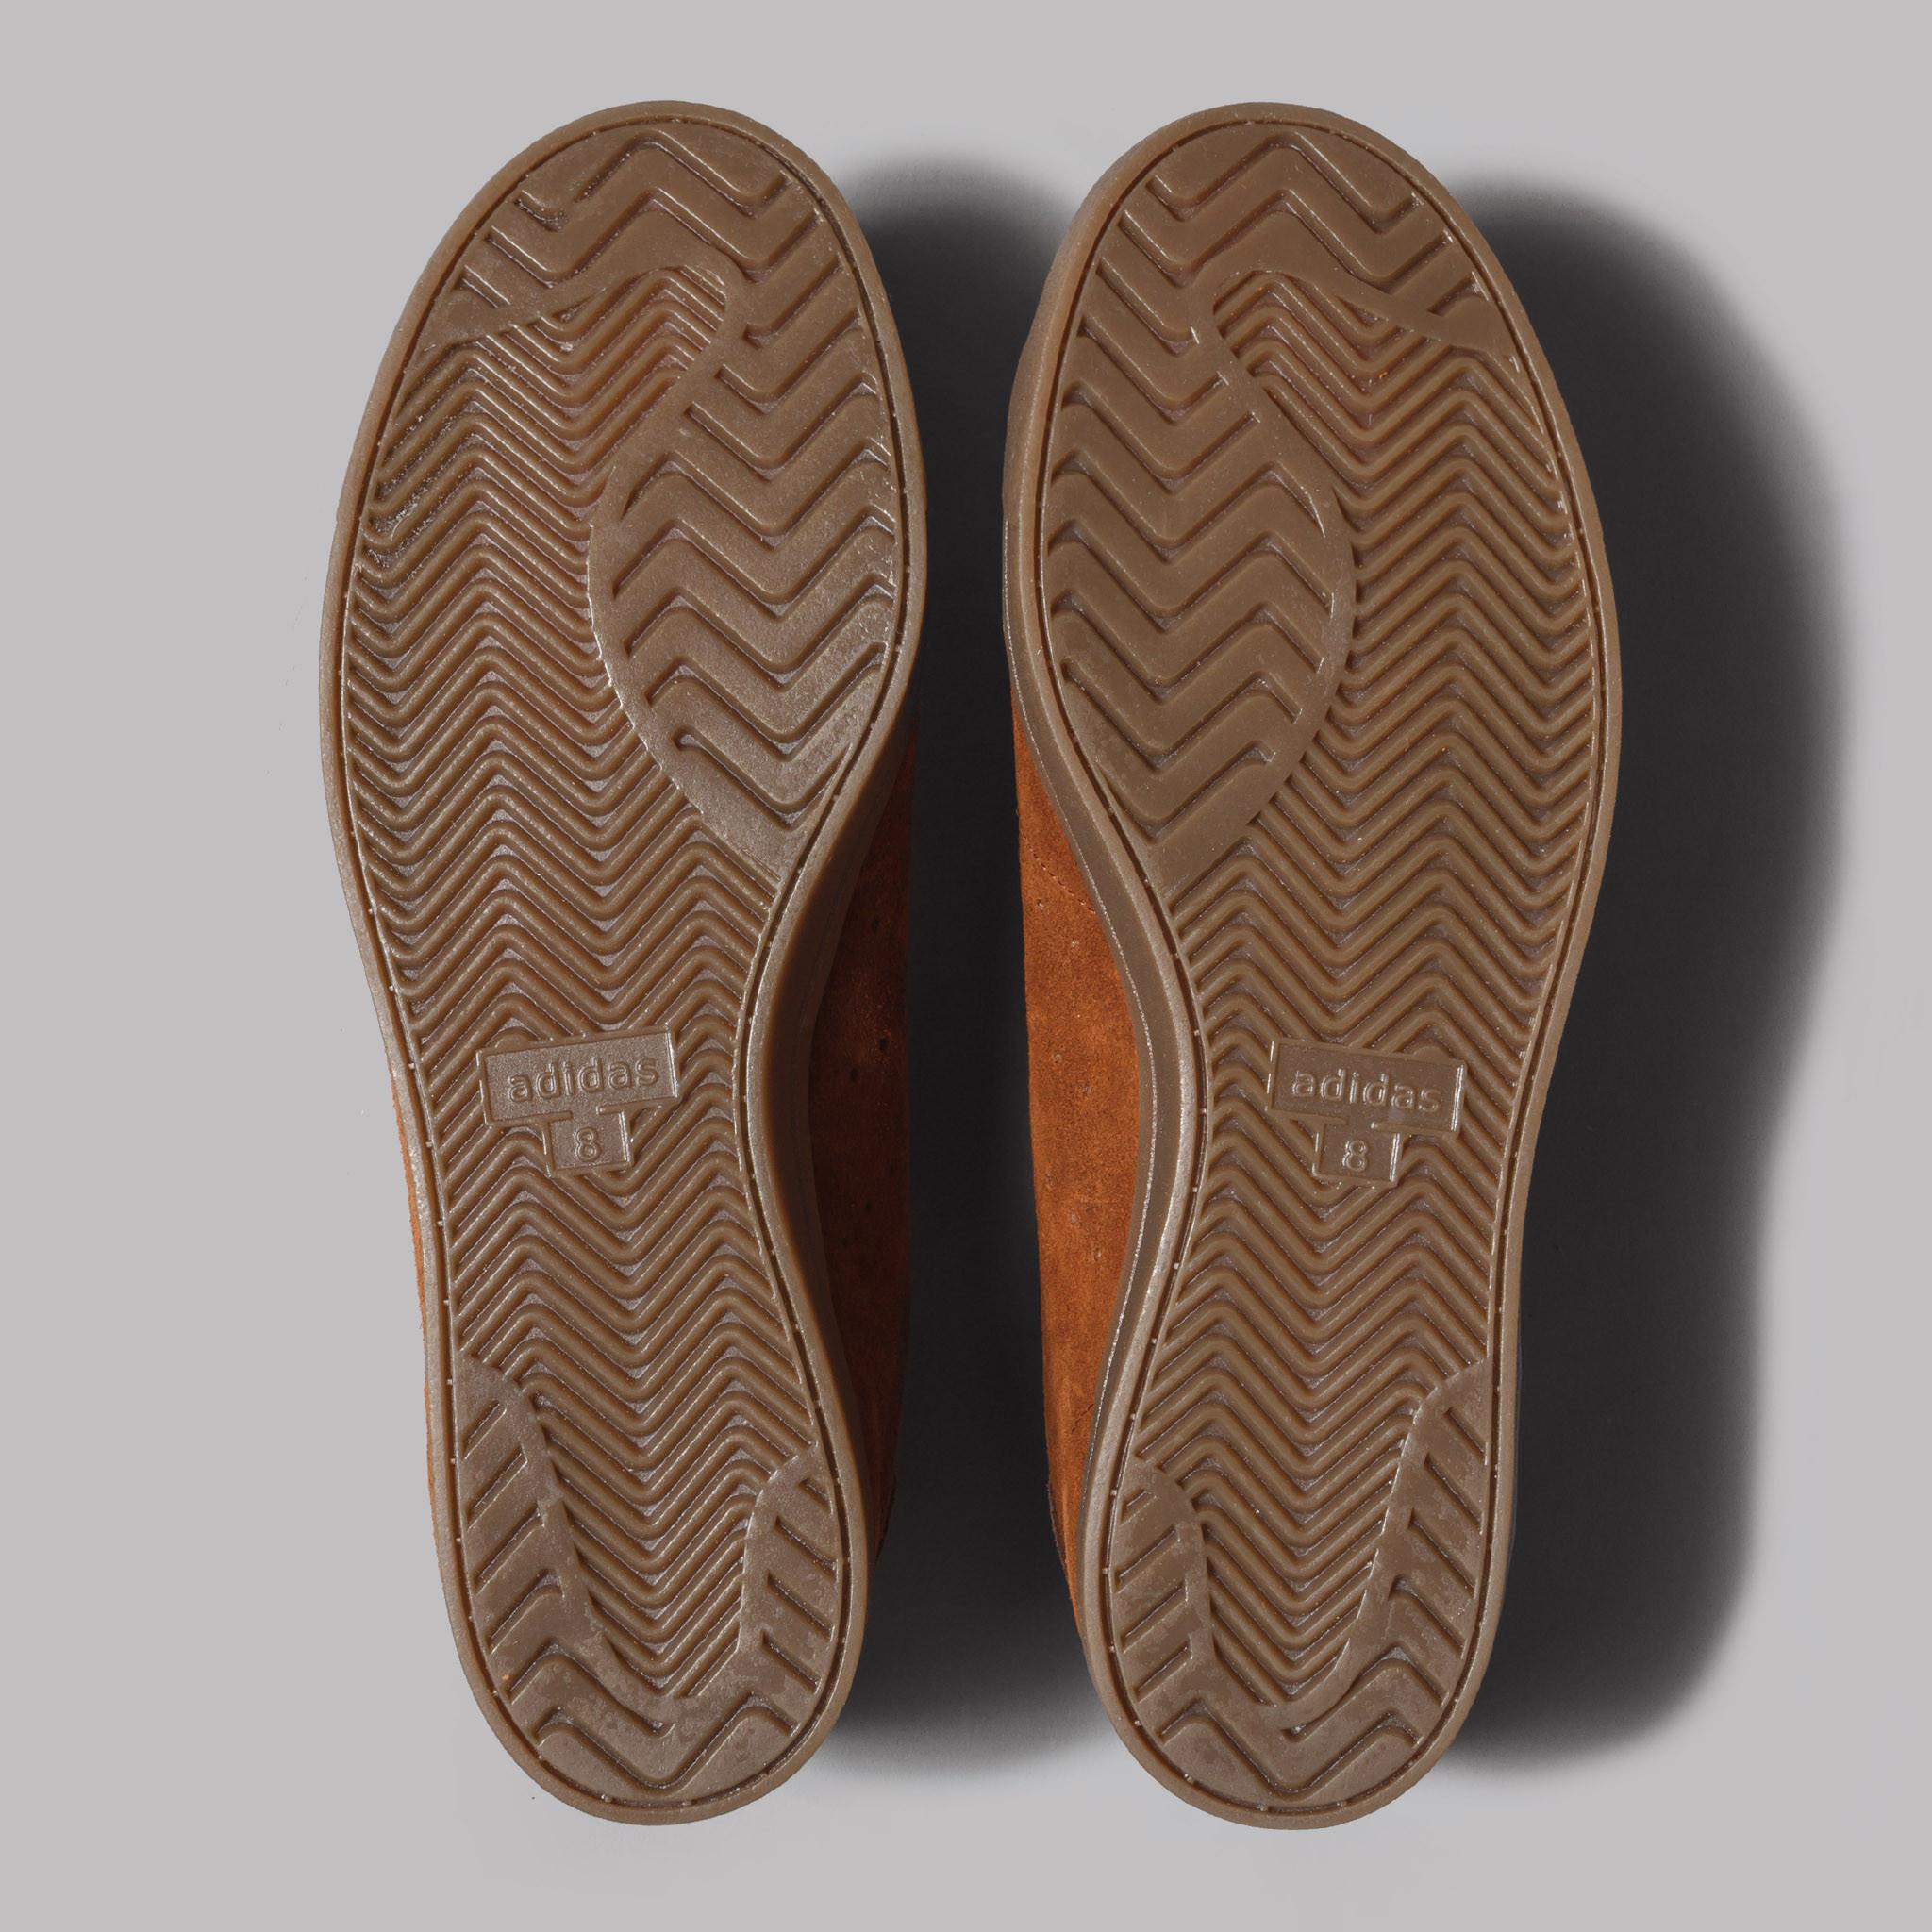 Adidas-Spezial-160316-01-04